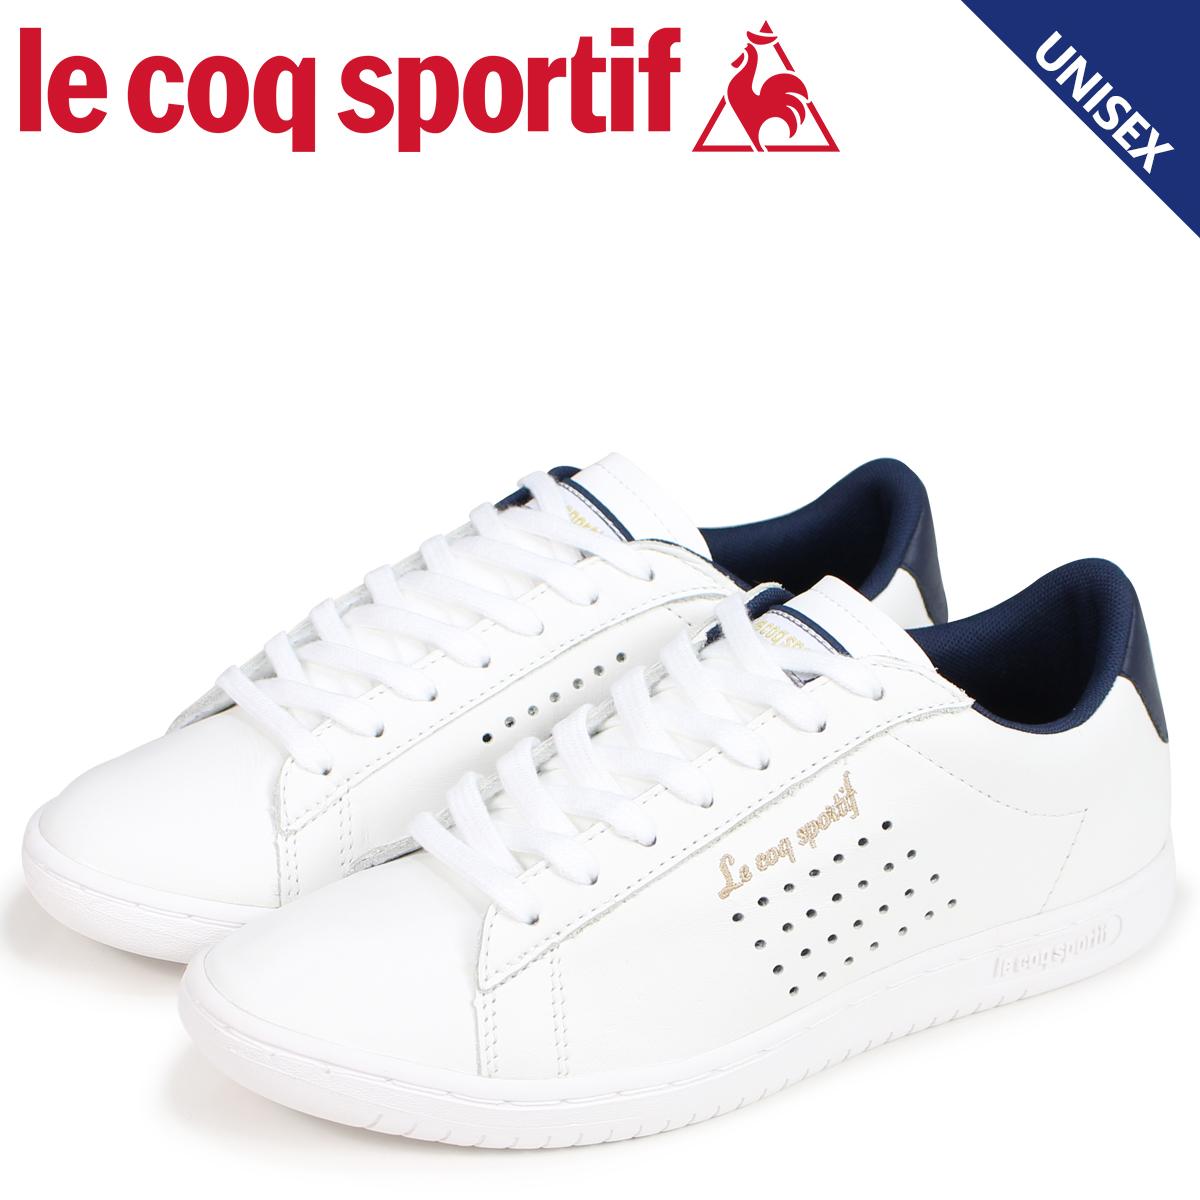 8bdea1f7a6a2 le coq sportif Le Coq Sportif men gap Dis sneakers Arthur Ashe nostalgic  ARTHUR ASHE RETRO white 1810313  load planned Shinnyu load in reservation  product ...